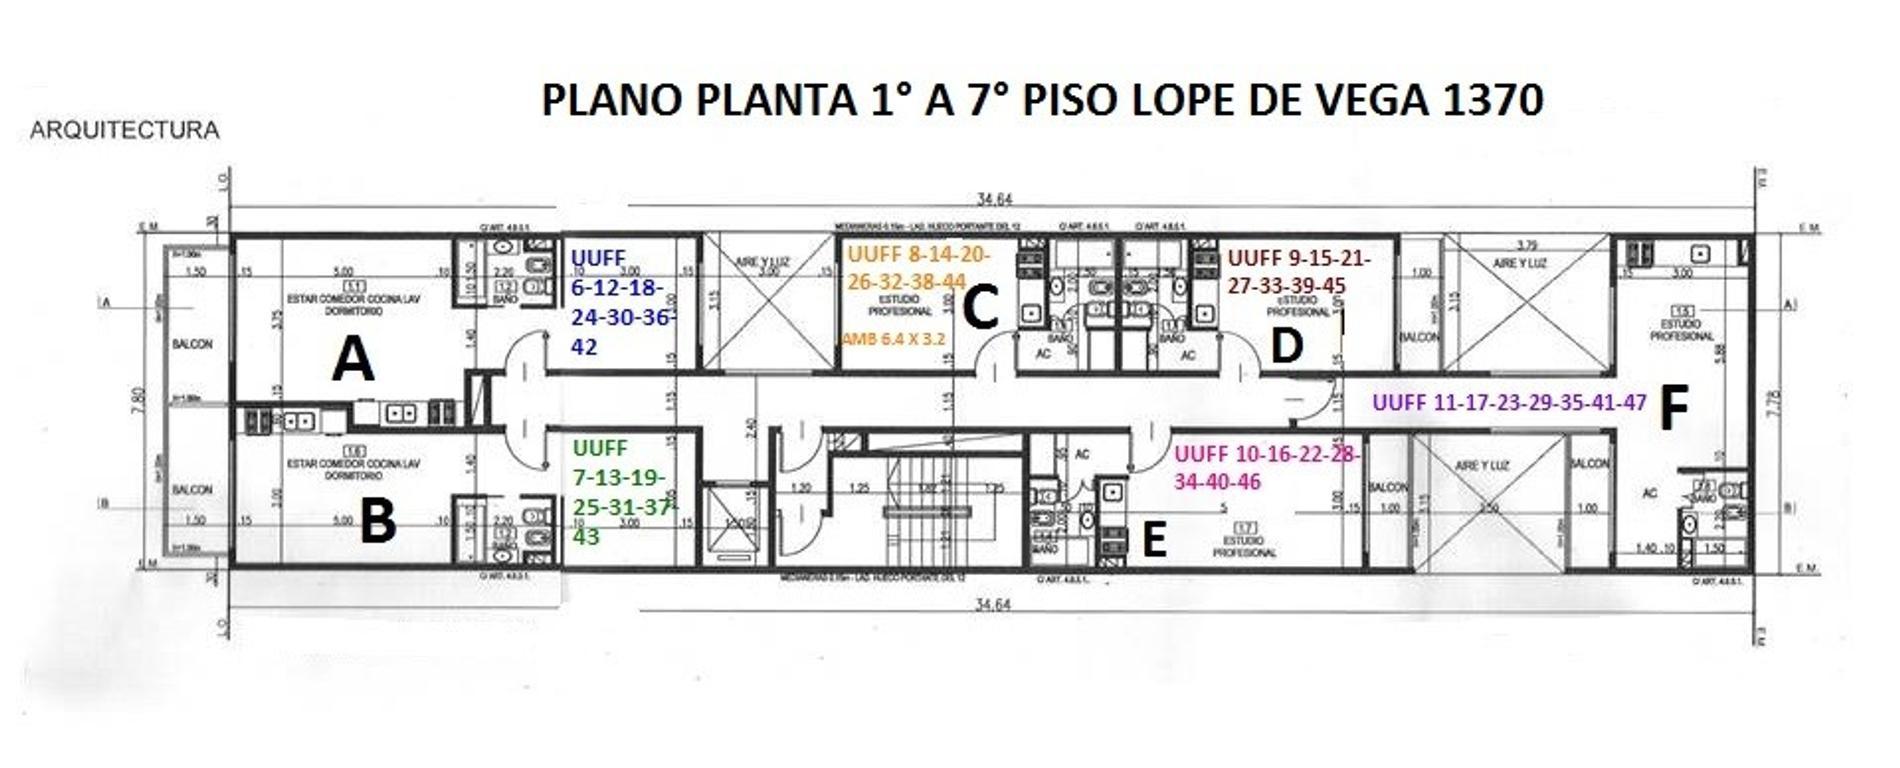 XINTEL(NIR-NIR-1068) Departamento - Venta - Argentina, Capital Federal - AV. LOPE DE VEGA  AL 1300